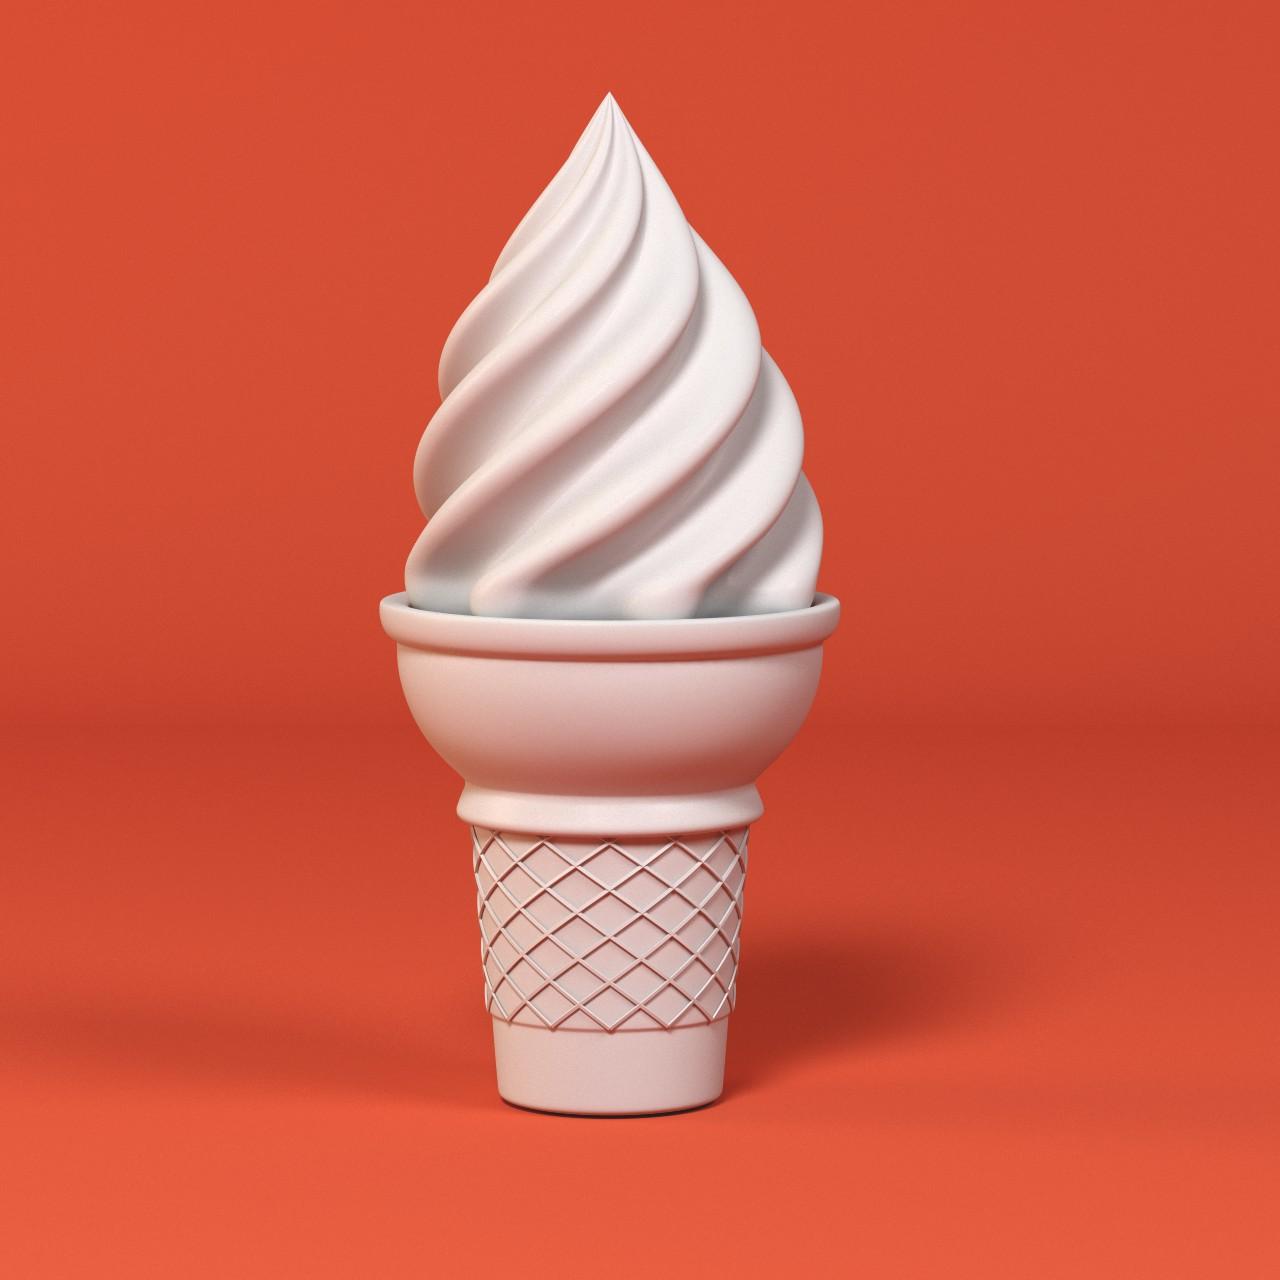 icecream_1.jpg